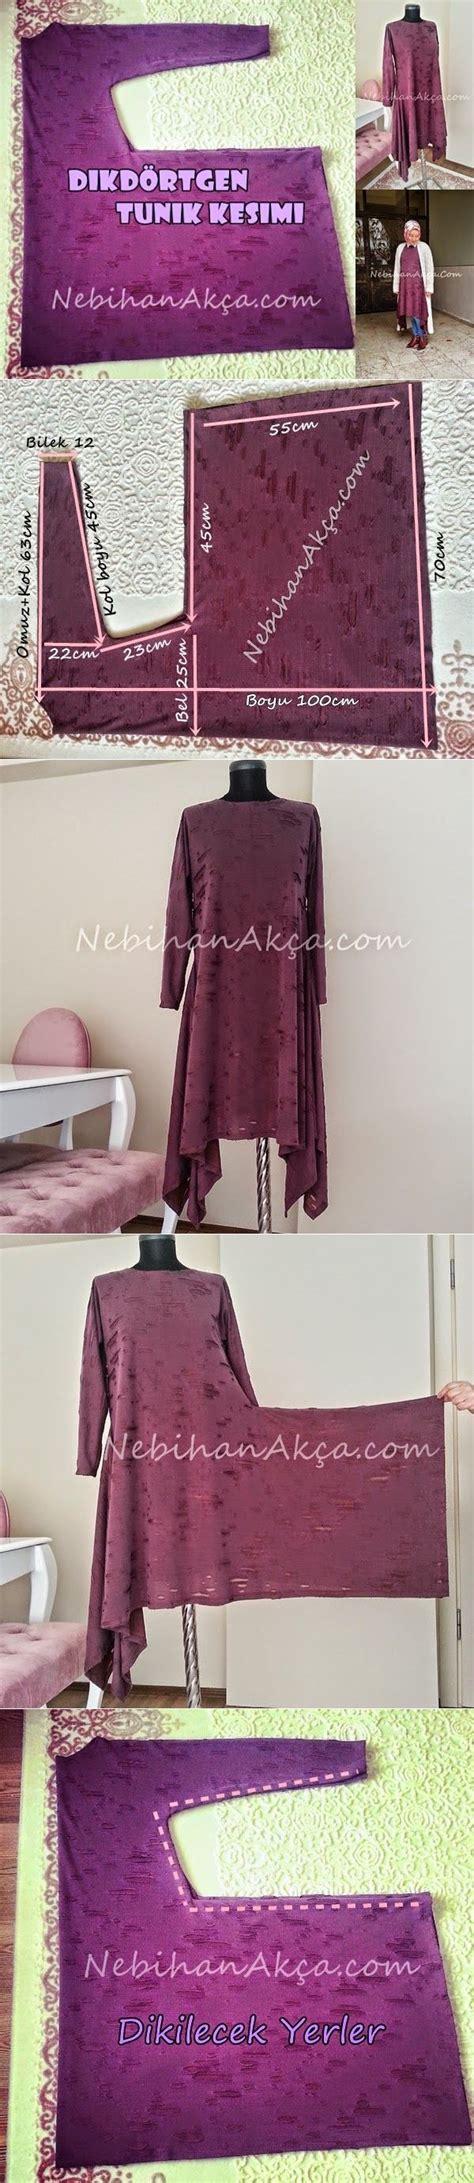 Ll Cut Out Line Dress Dress Wanita Baju Dress Midi Rrs64 17 Best Images About Sewingness On Sewing